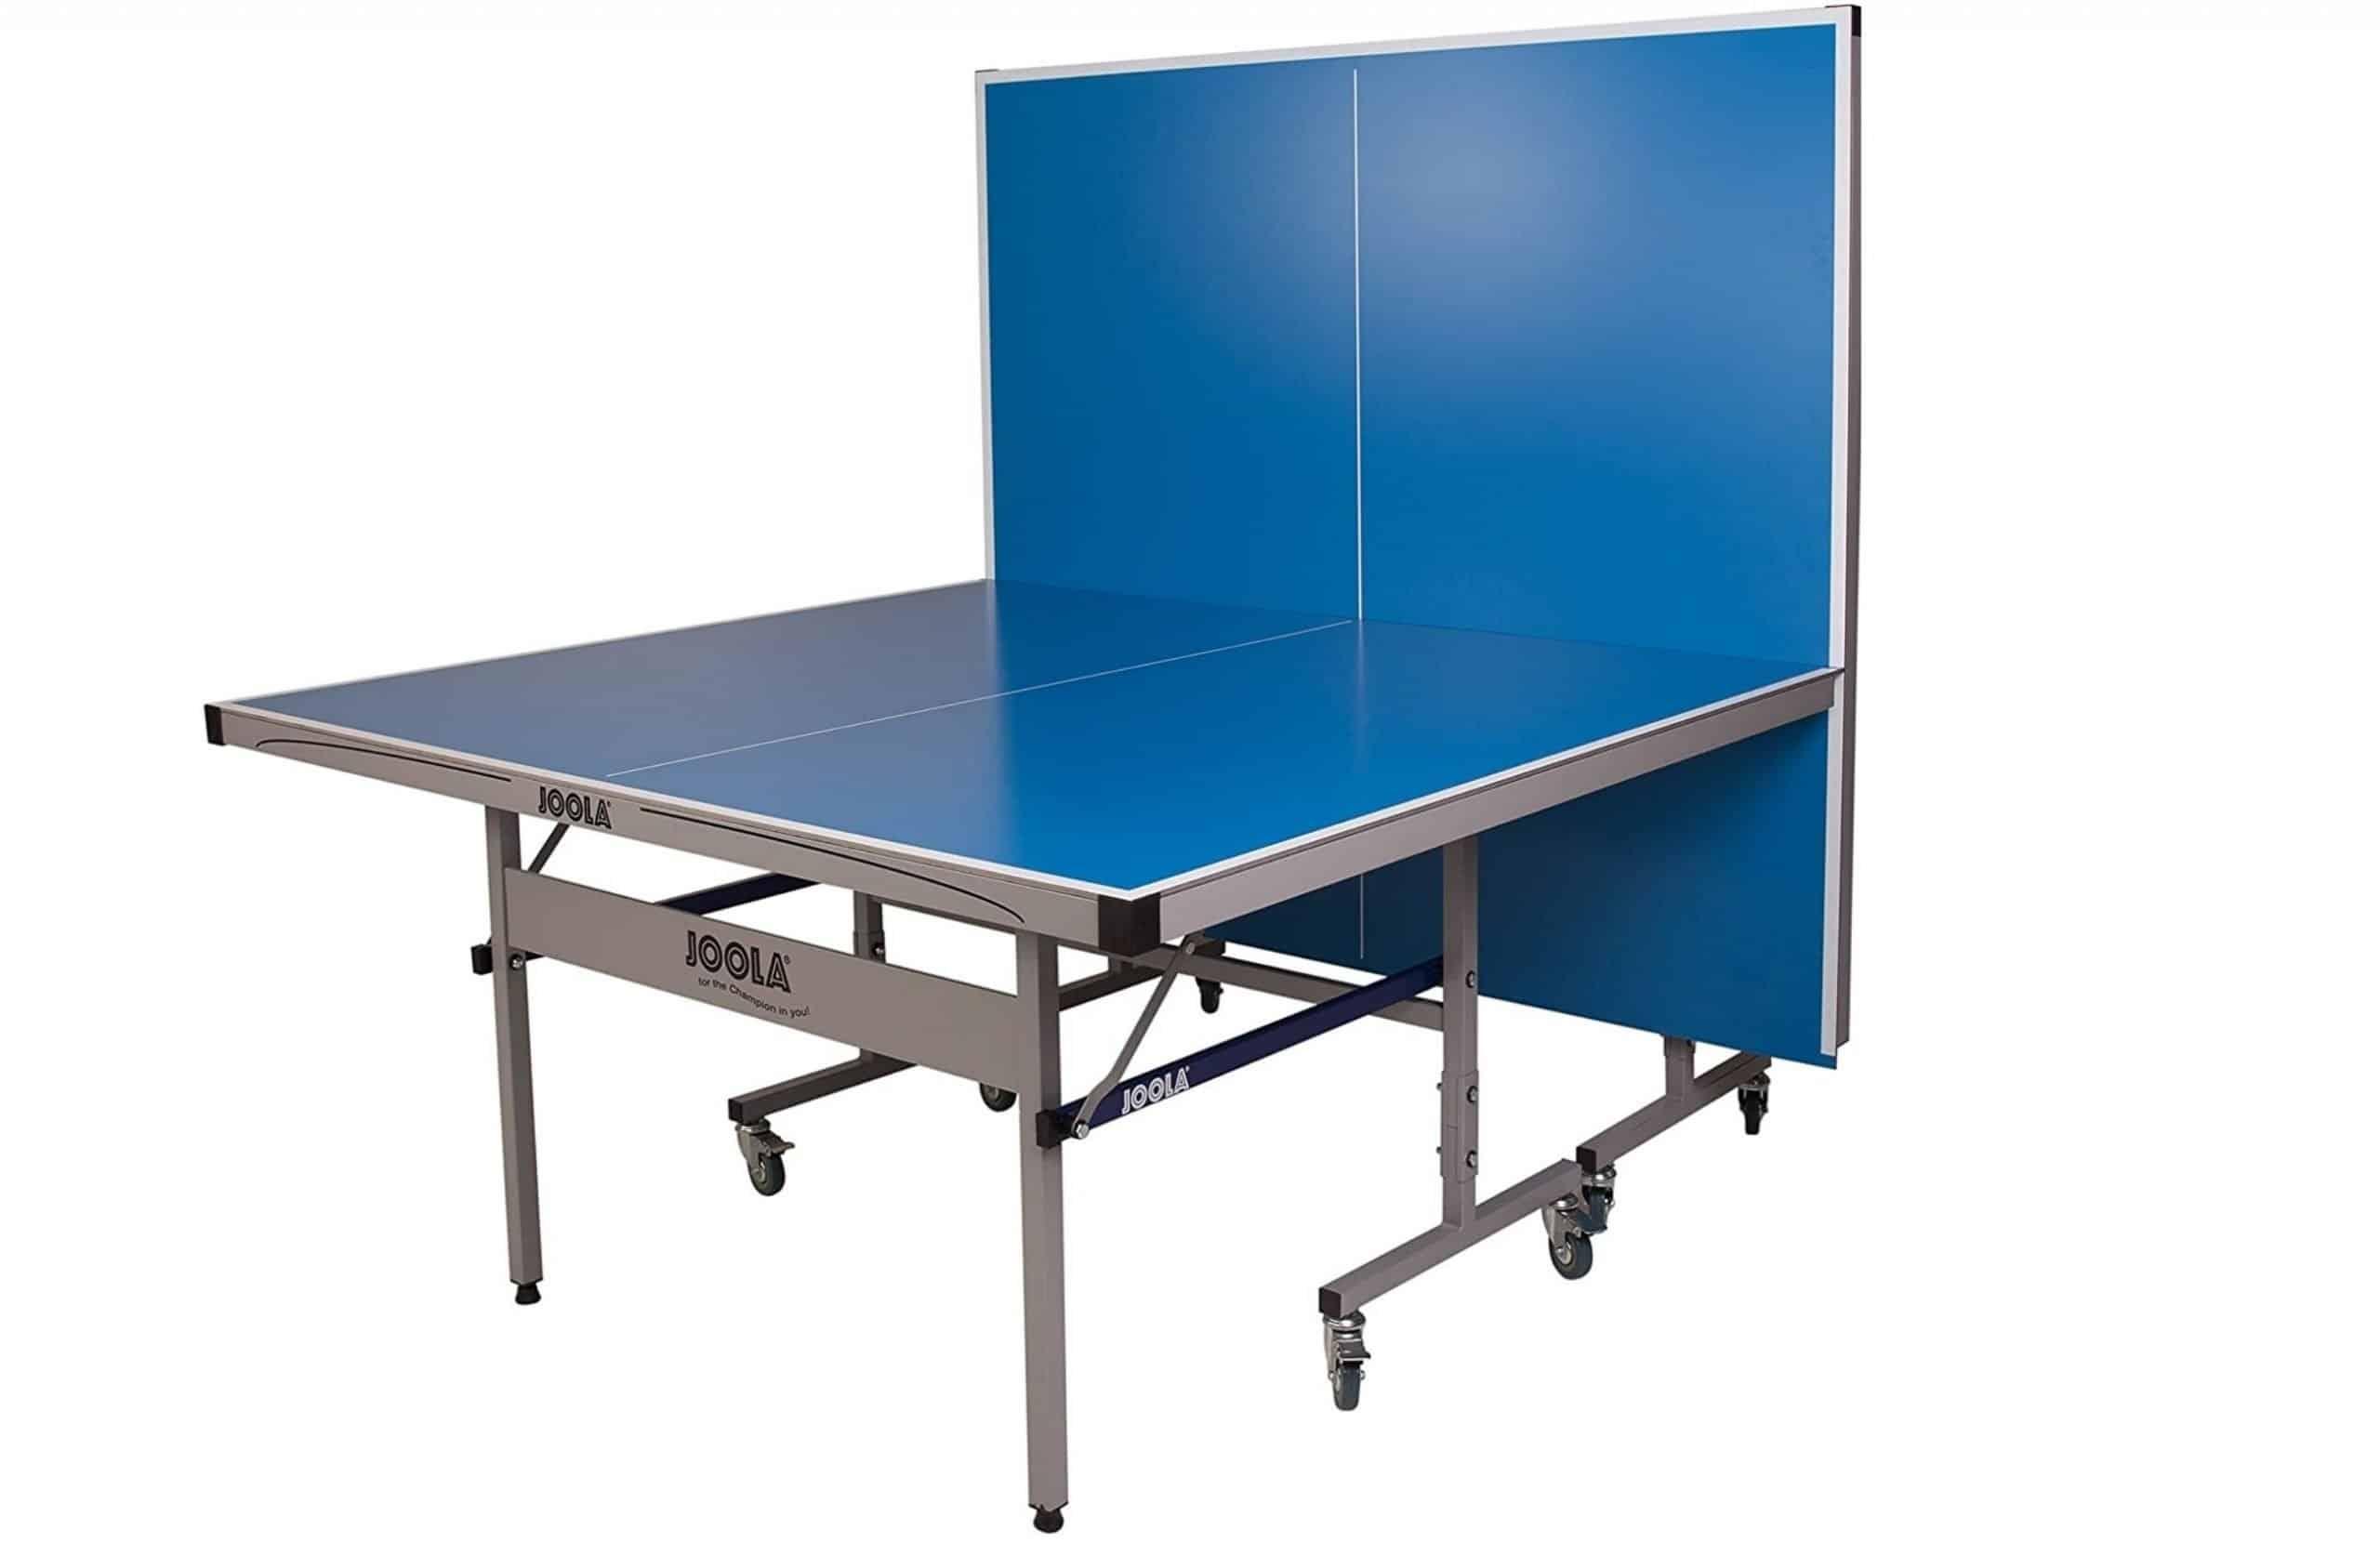 Joola Nova Table Tennis Table